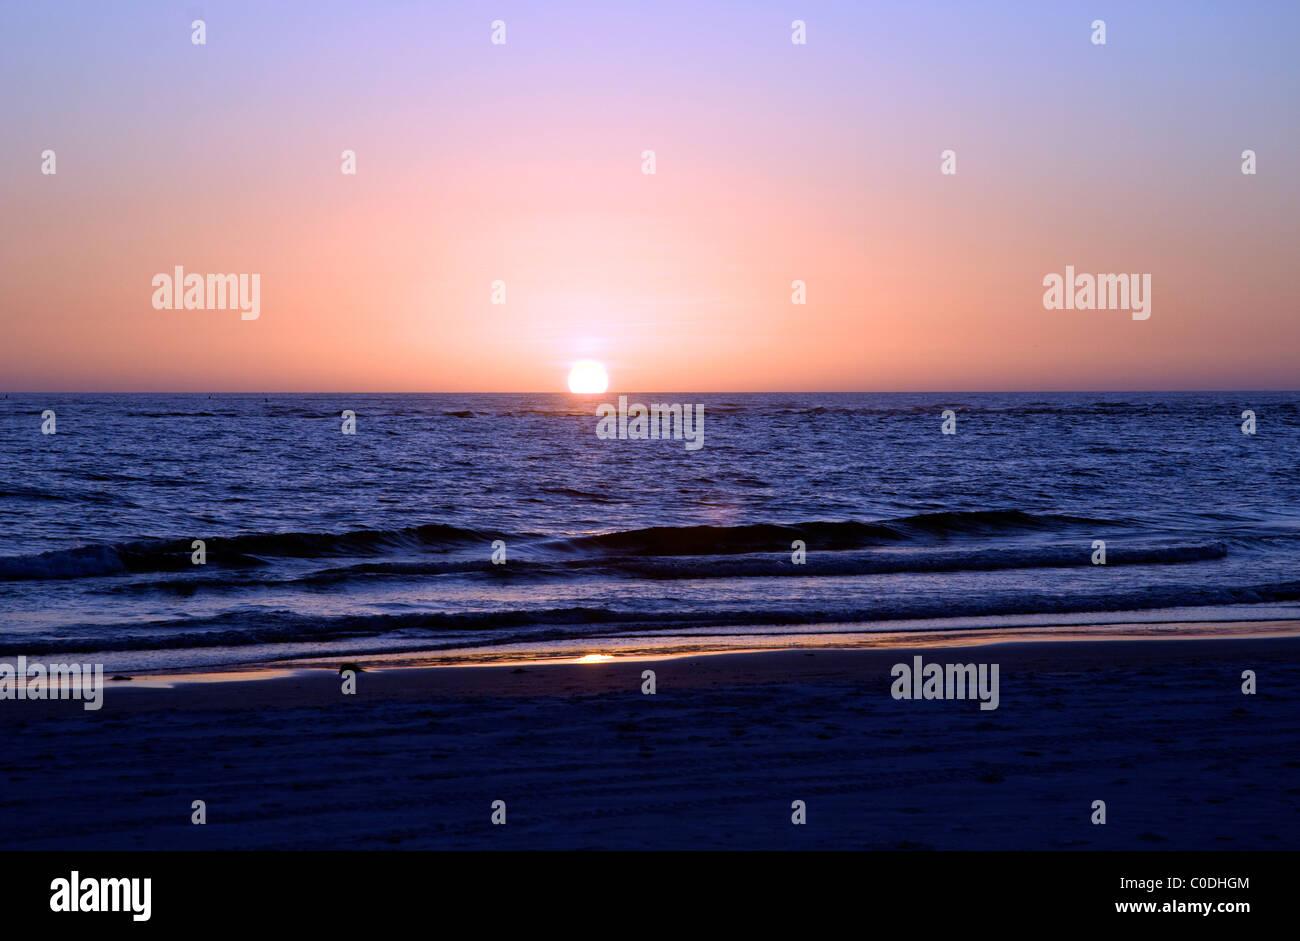 Dawn, Siesta Key Beach, Florida, Sarasota, USA - Stock Image